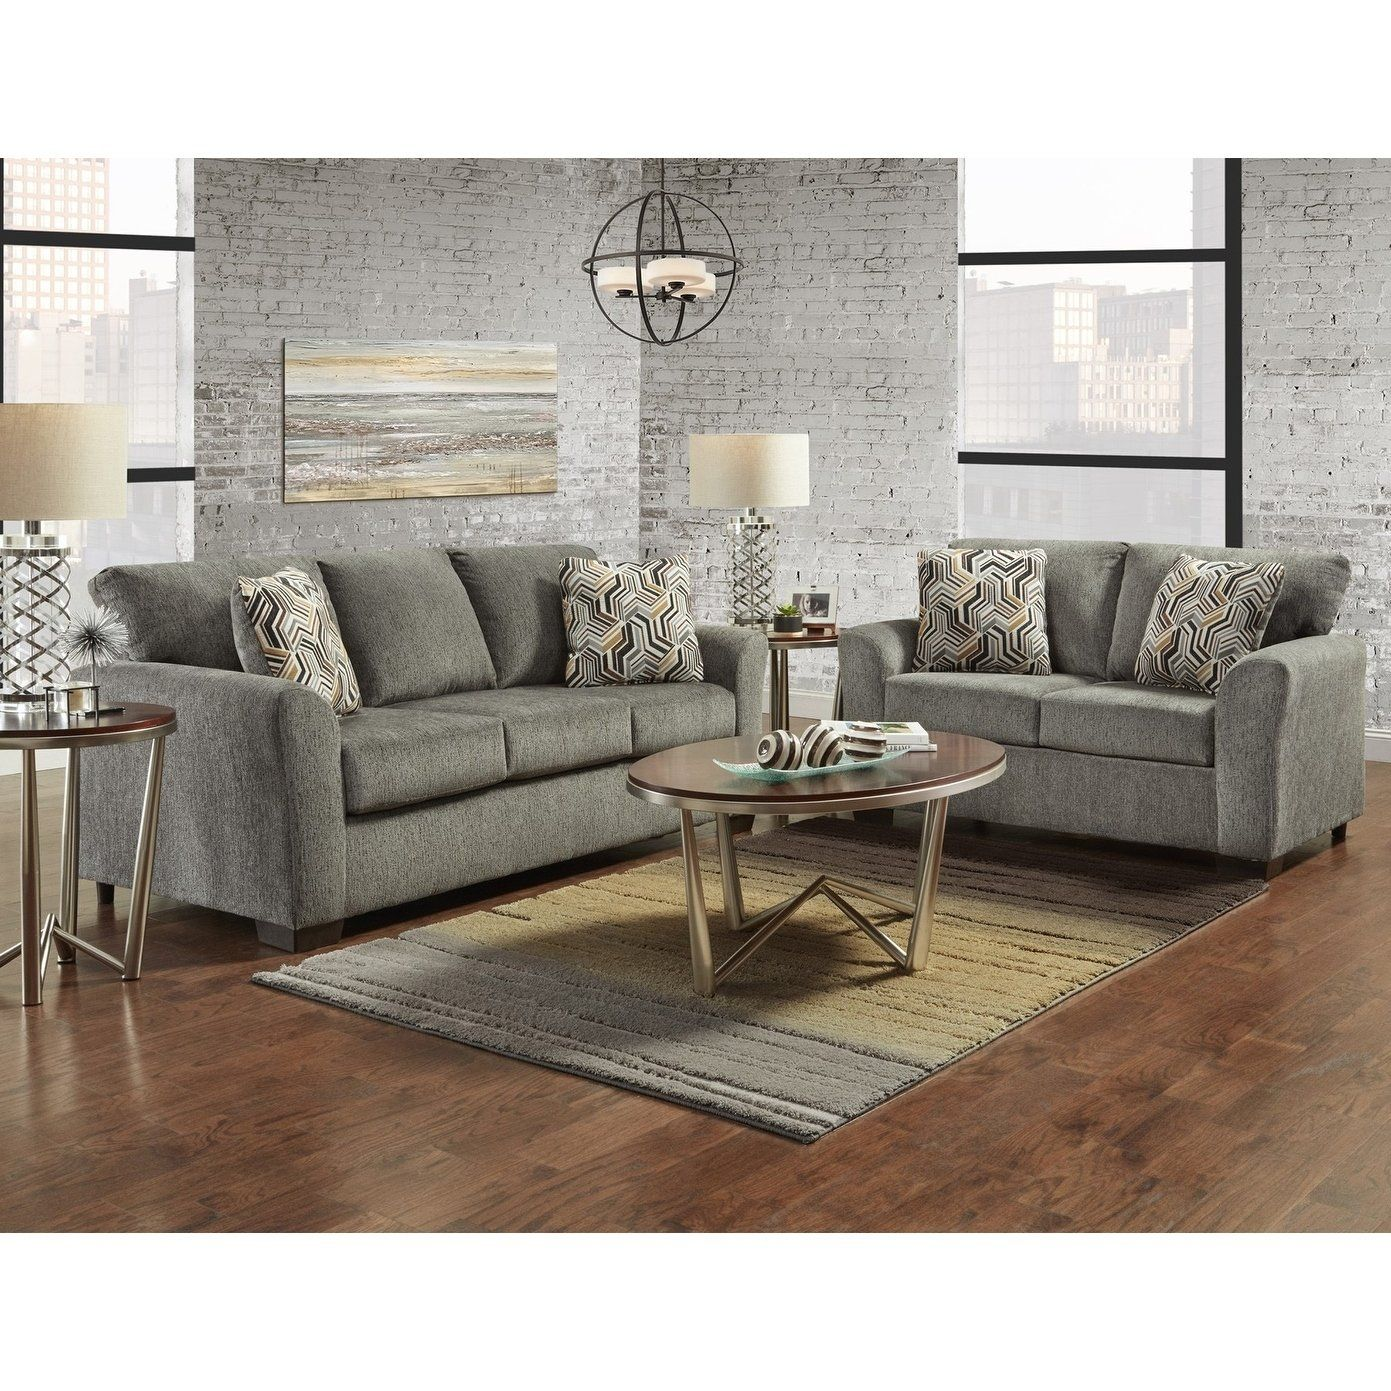 Awe Inspiring Sofatrendz Cariana Grey Sofa Loveseat 2 Pc Set Gray Frankydiablos Diy Chair Ideas Frankydiabloscom